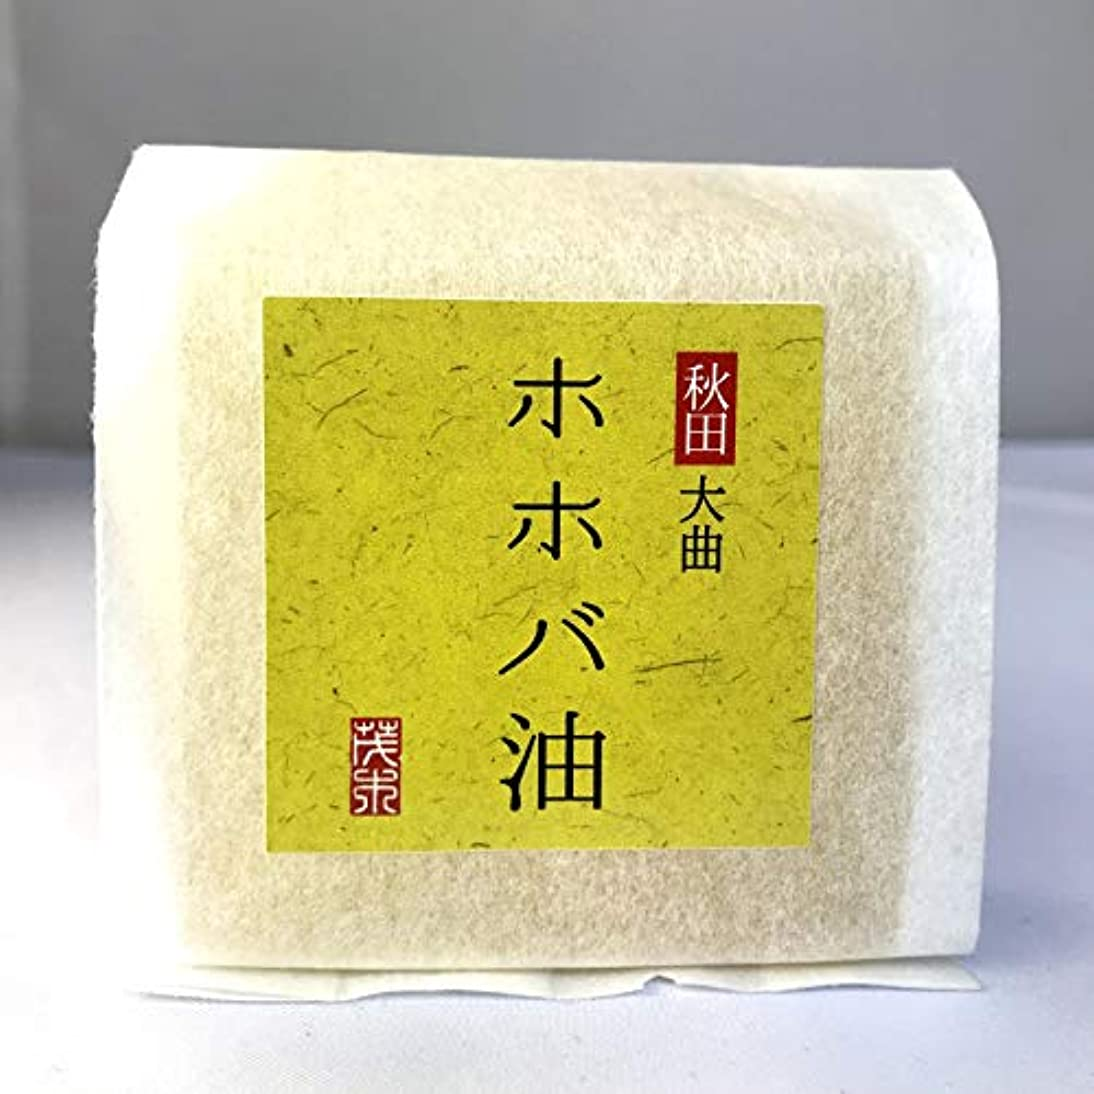 無添加石鹸 ホホバ油石鹸 100g